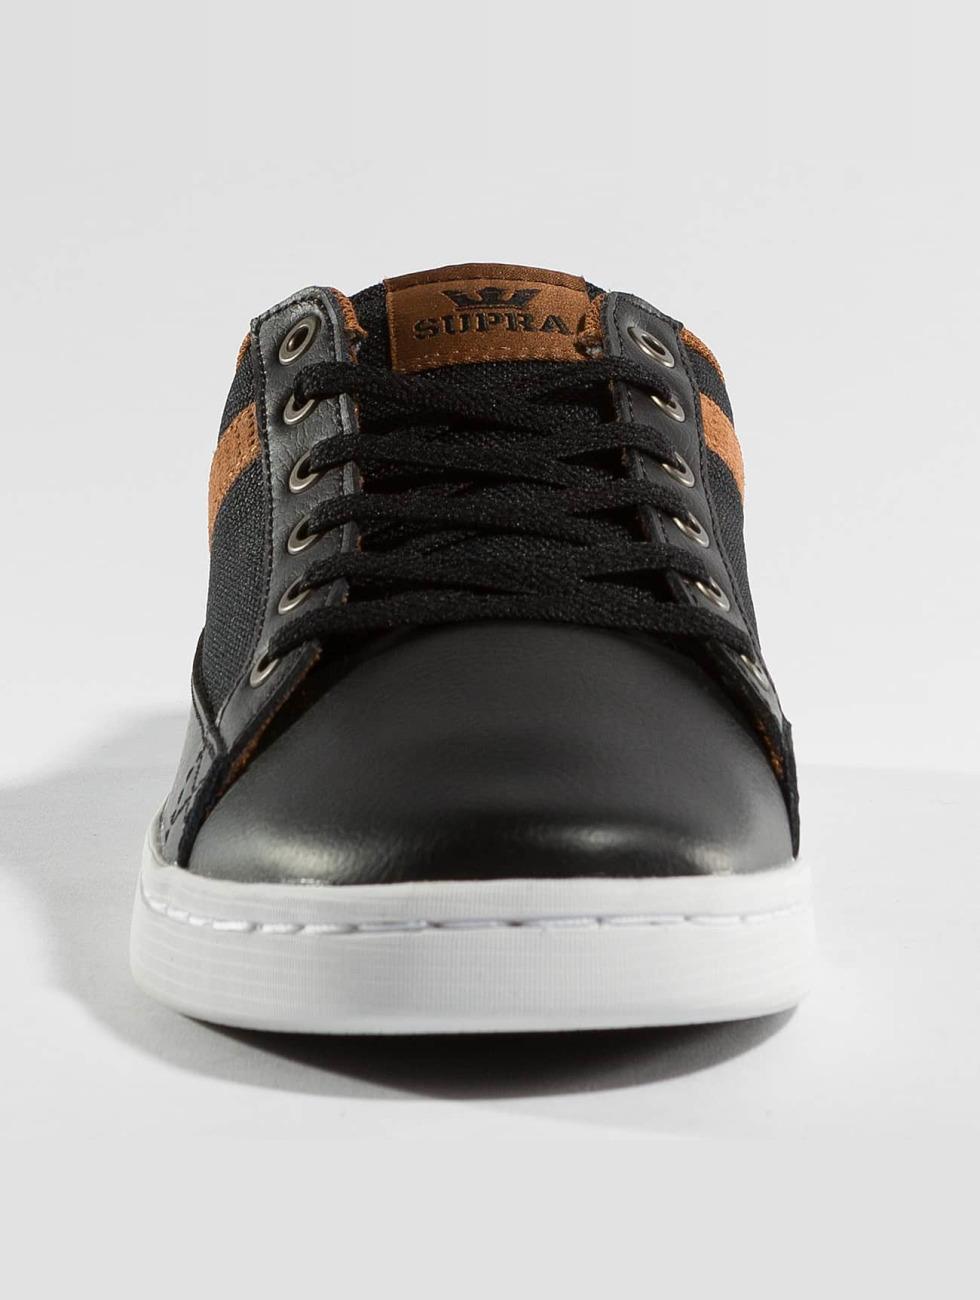 Supra schoen / sneaker Westlake in zwart 395104 Perfect Te Koop rVmeJ